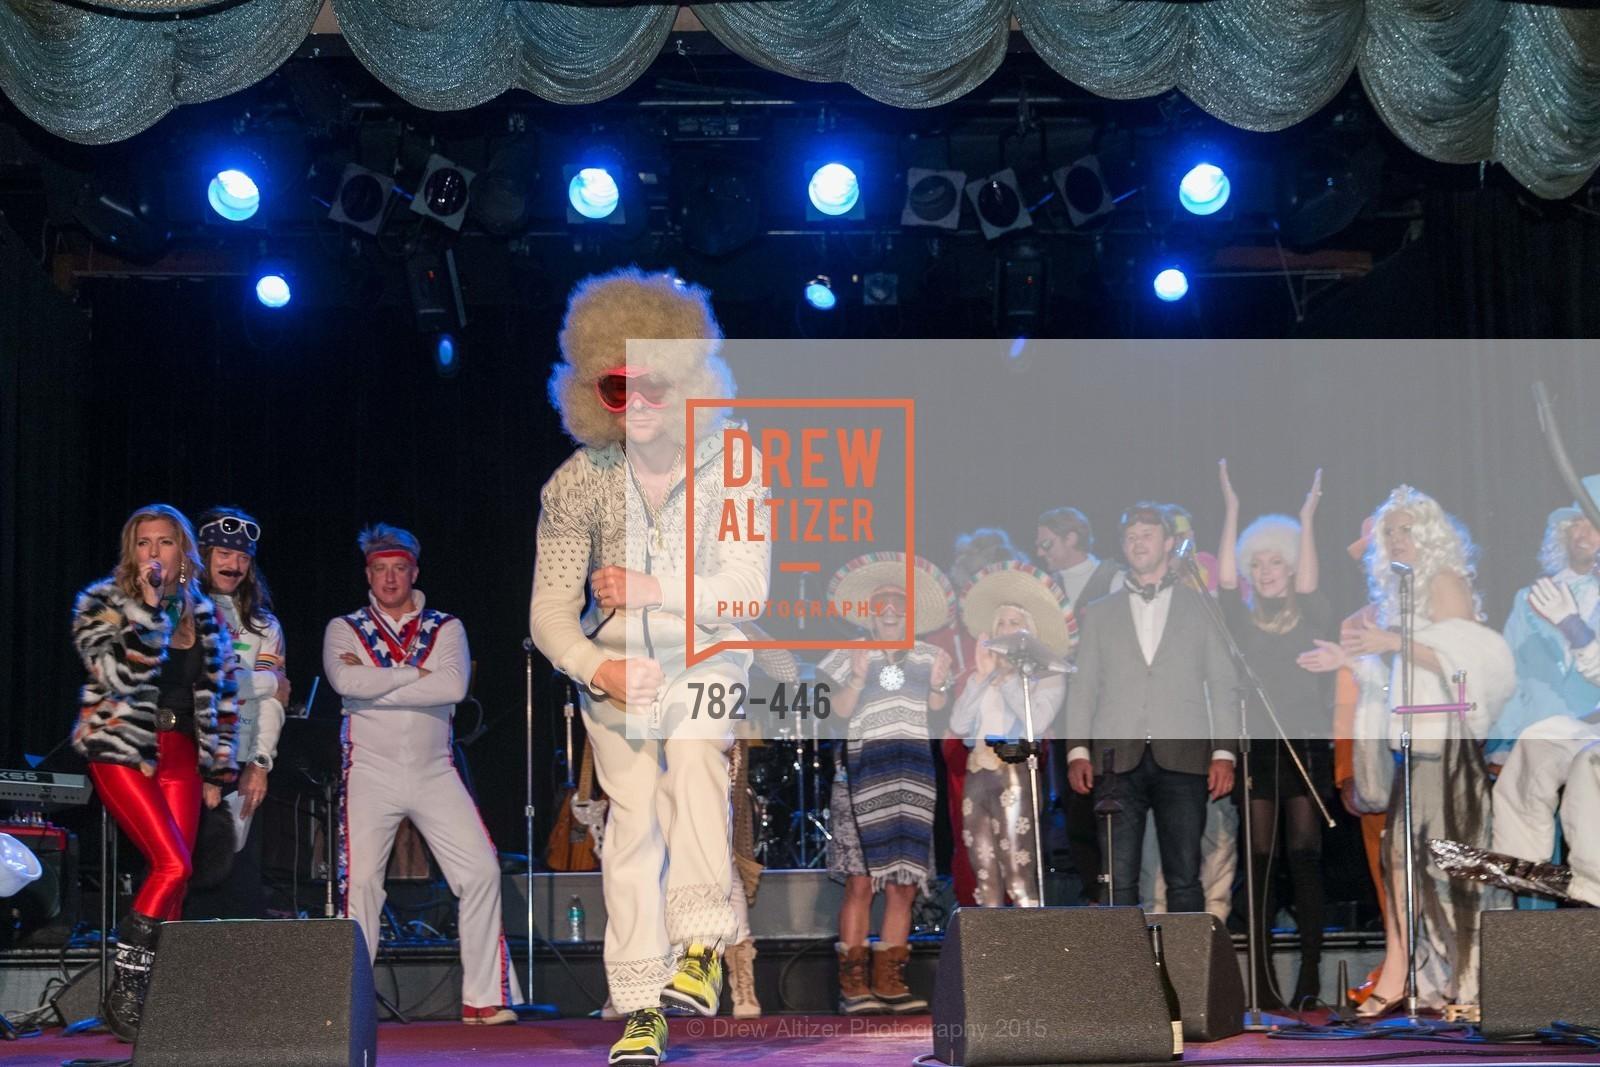 Rob Webb, U.S. Ski and Snowboard Foundation's Snow Ball, Bimbo's 365 Club. 1025 Columbus Ave, November 7th, 2015,Drew Altizer, Drew Altizer Photography, full-service agency, private events, San Francisco photographer, photographer california